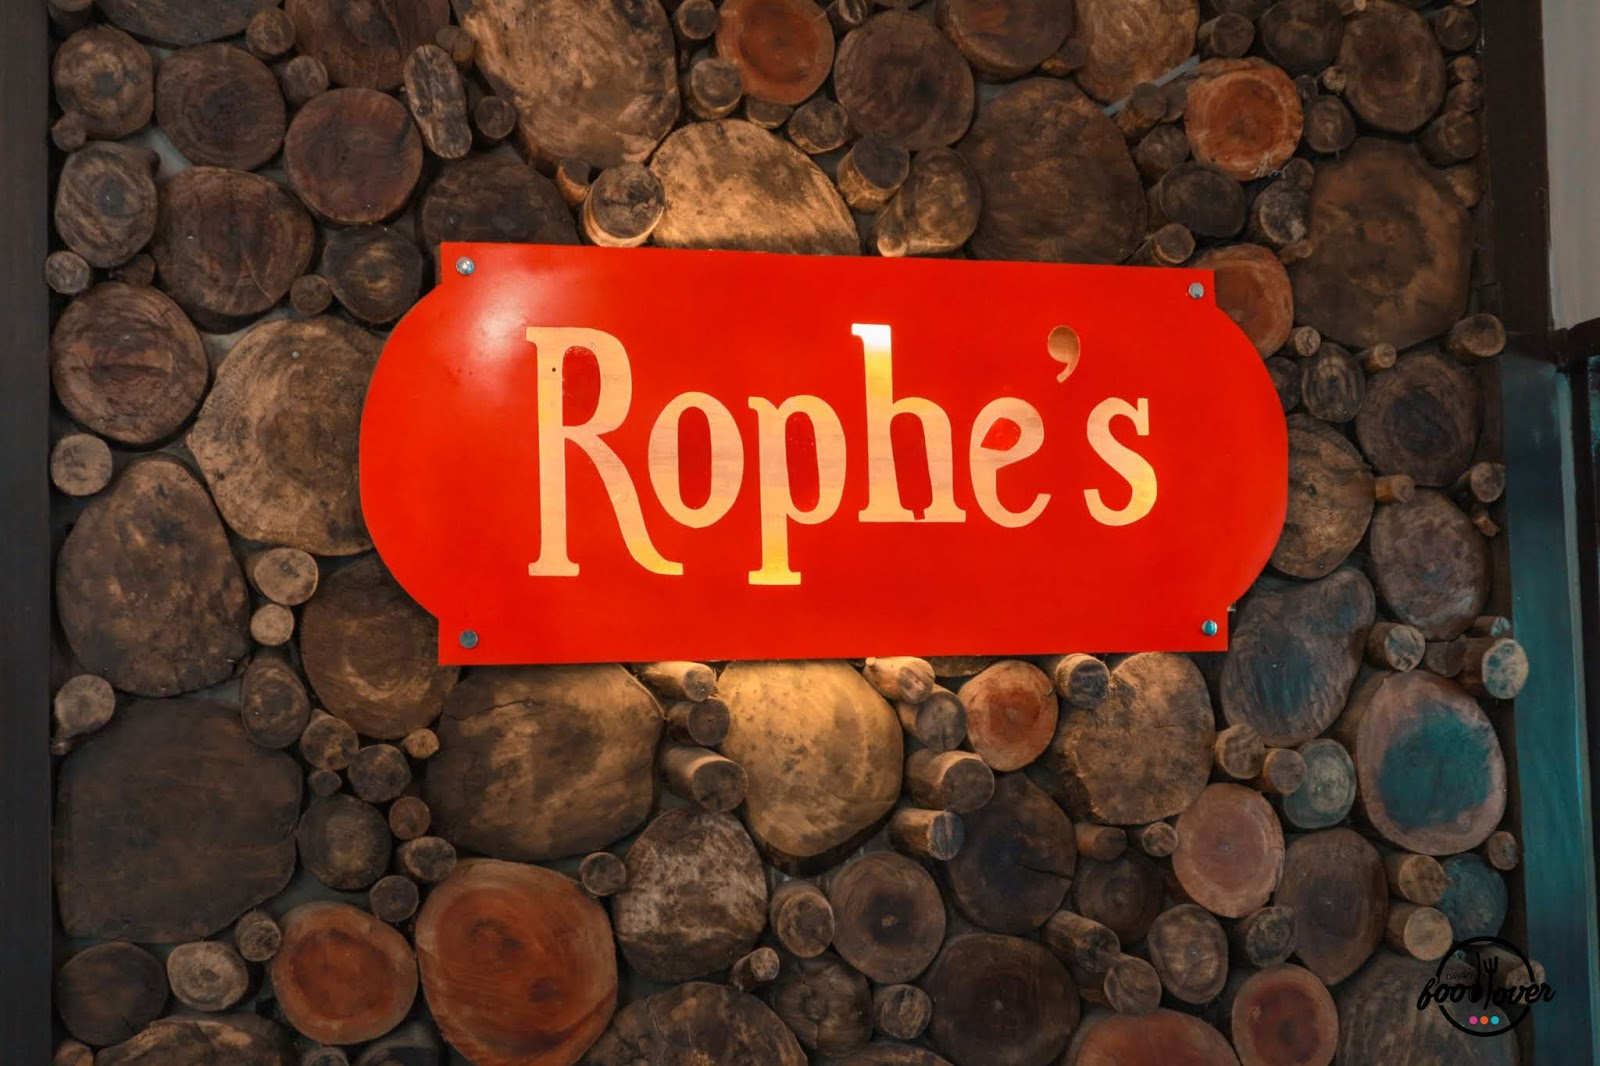 Rophe's Chicken